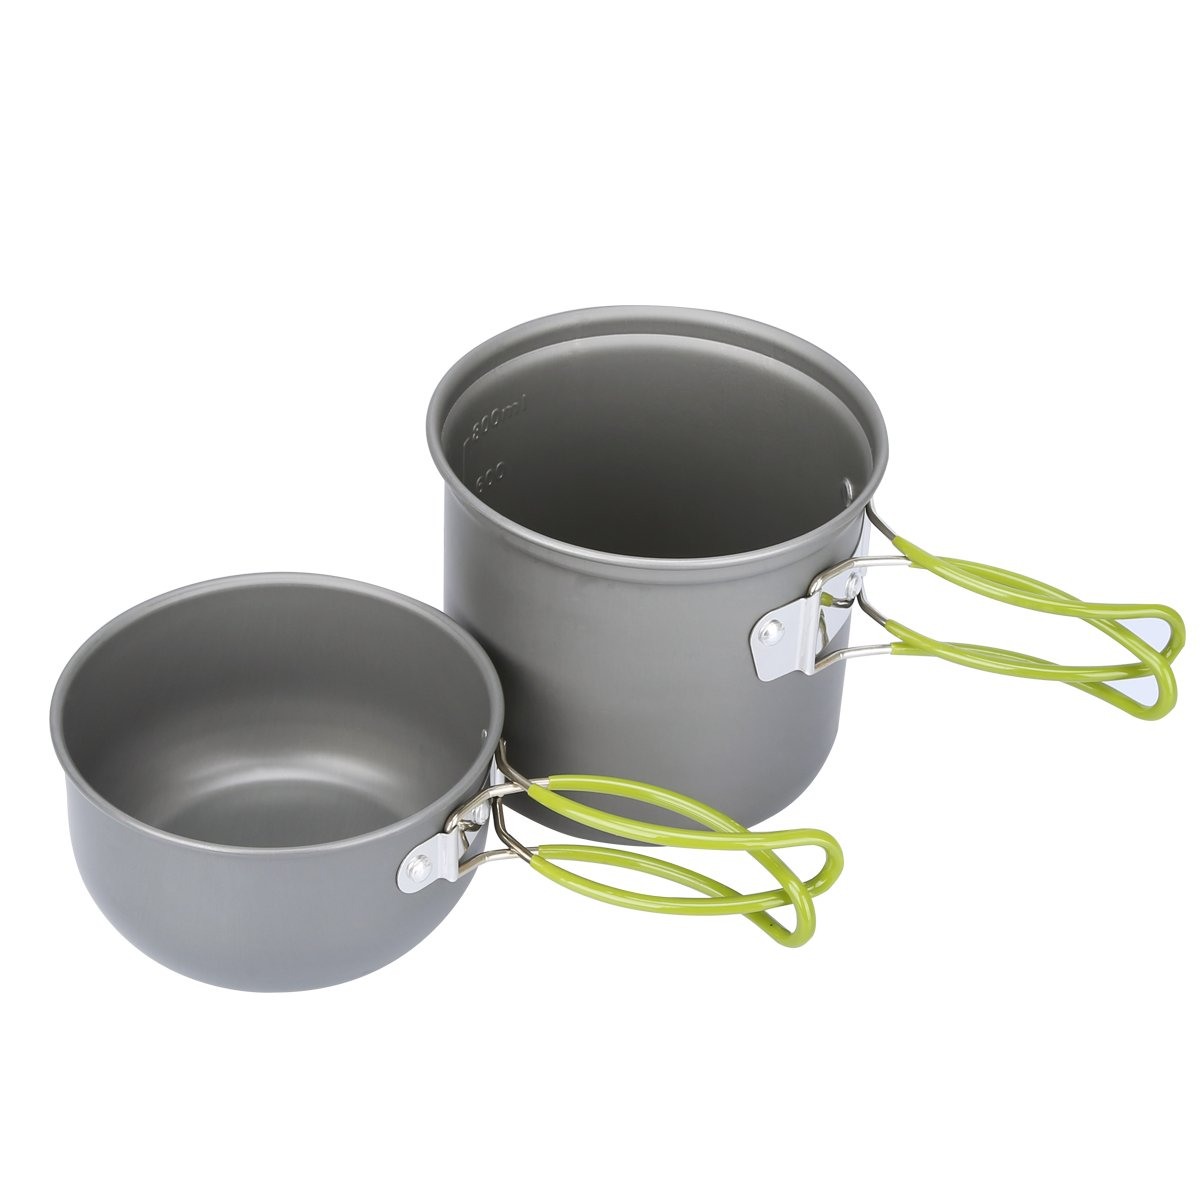 G4Free Outdoor Camping pan Hiking Cookware Backpacking Cooking Picnic Bowl Pot Pan Set 4 Piece Camping Cookware Mess Kit(2 PCS-Green) by G4Free